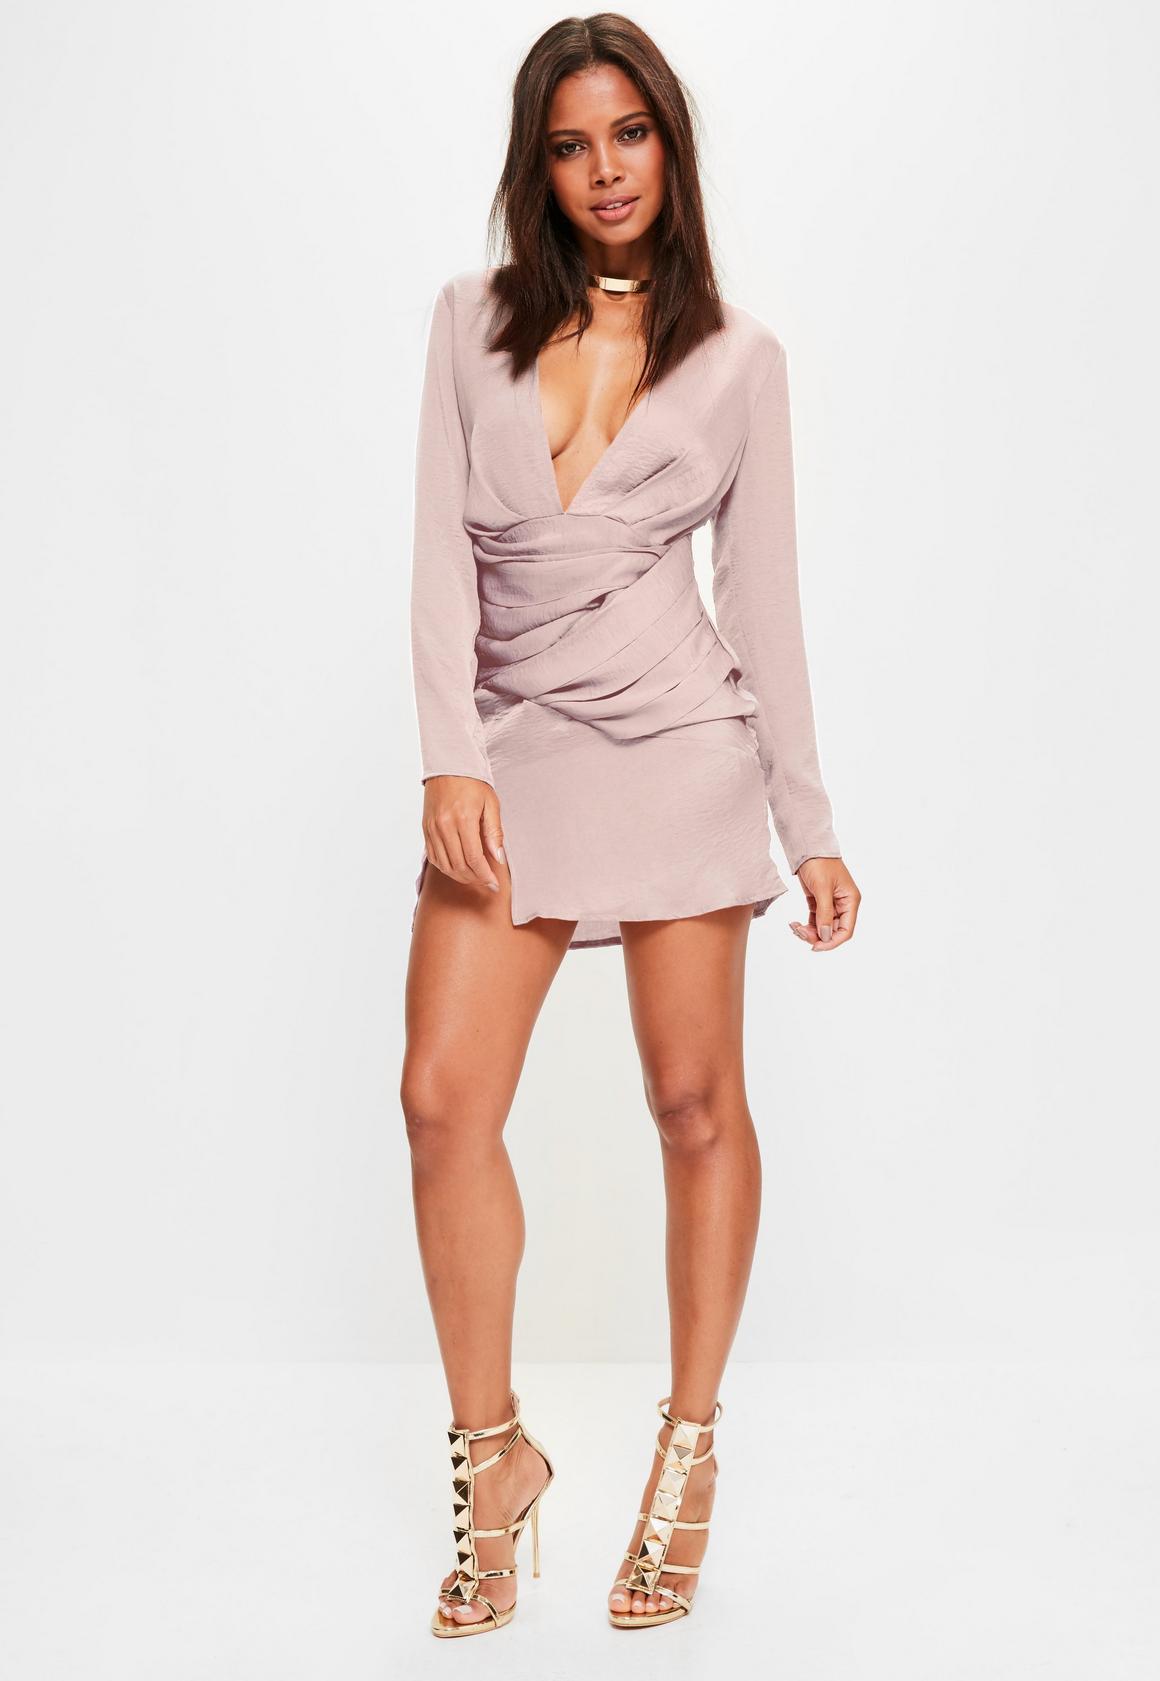 ac8da5767bd Missguided - Pink silky long sleeve panelled shift dress